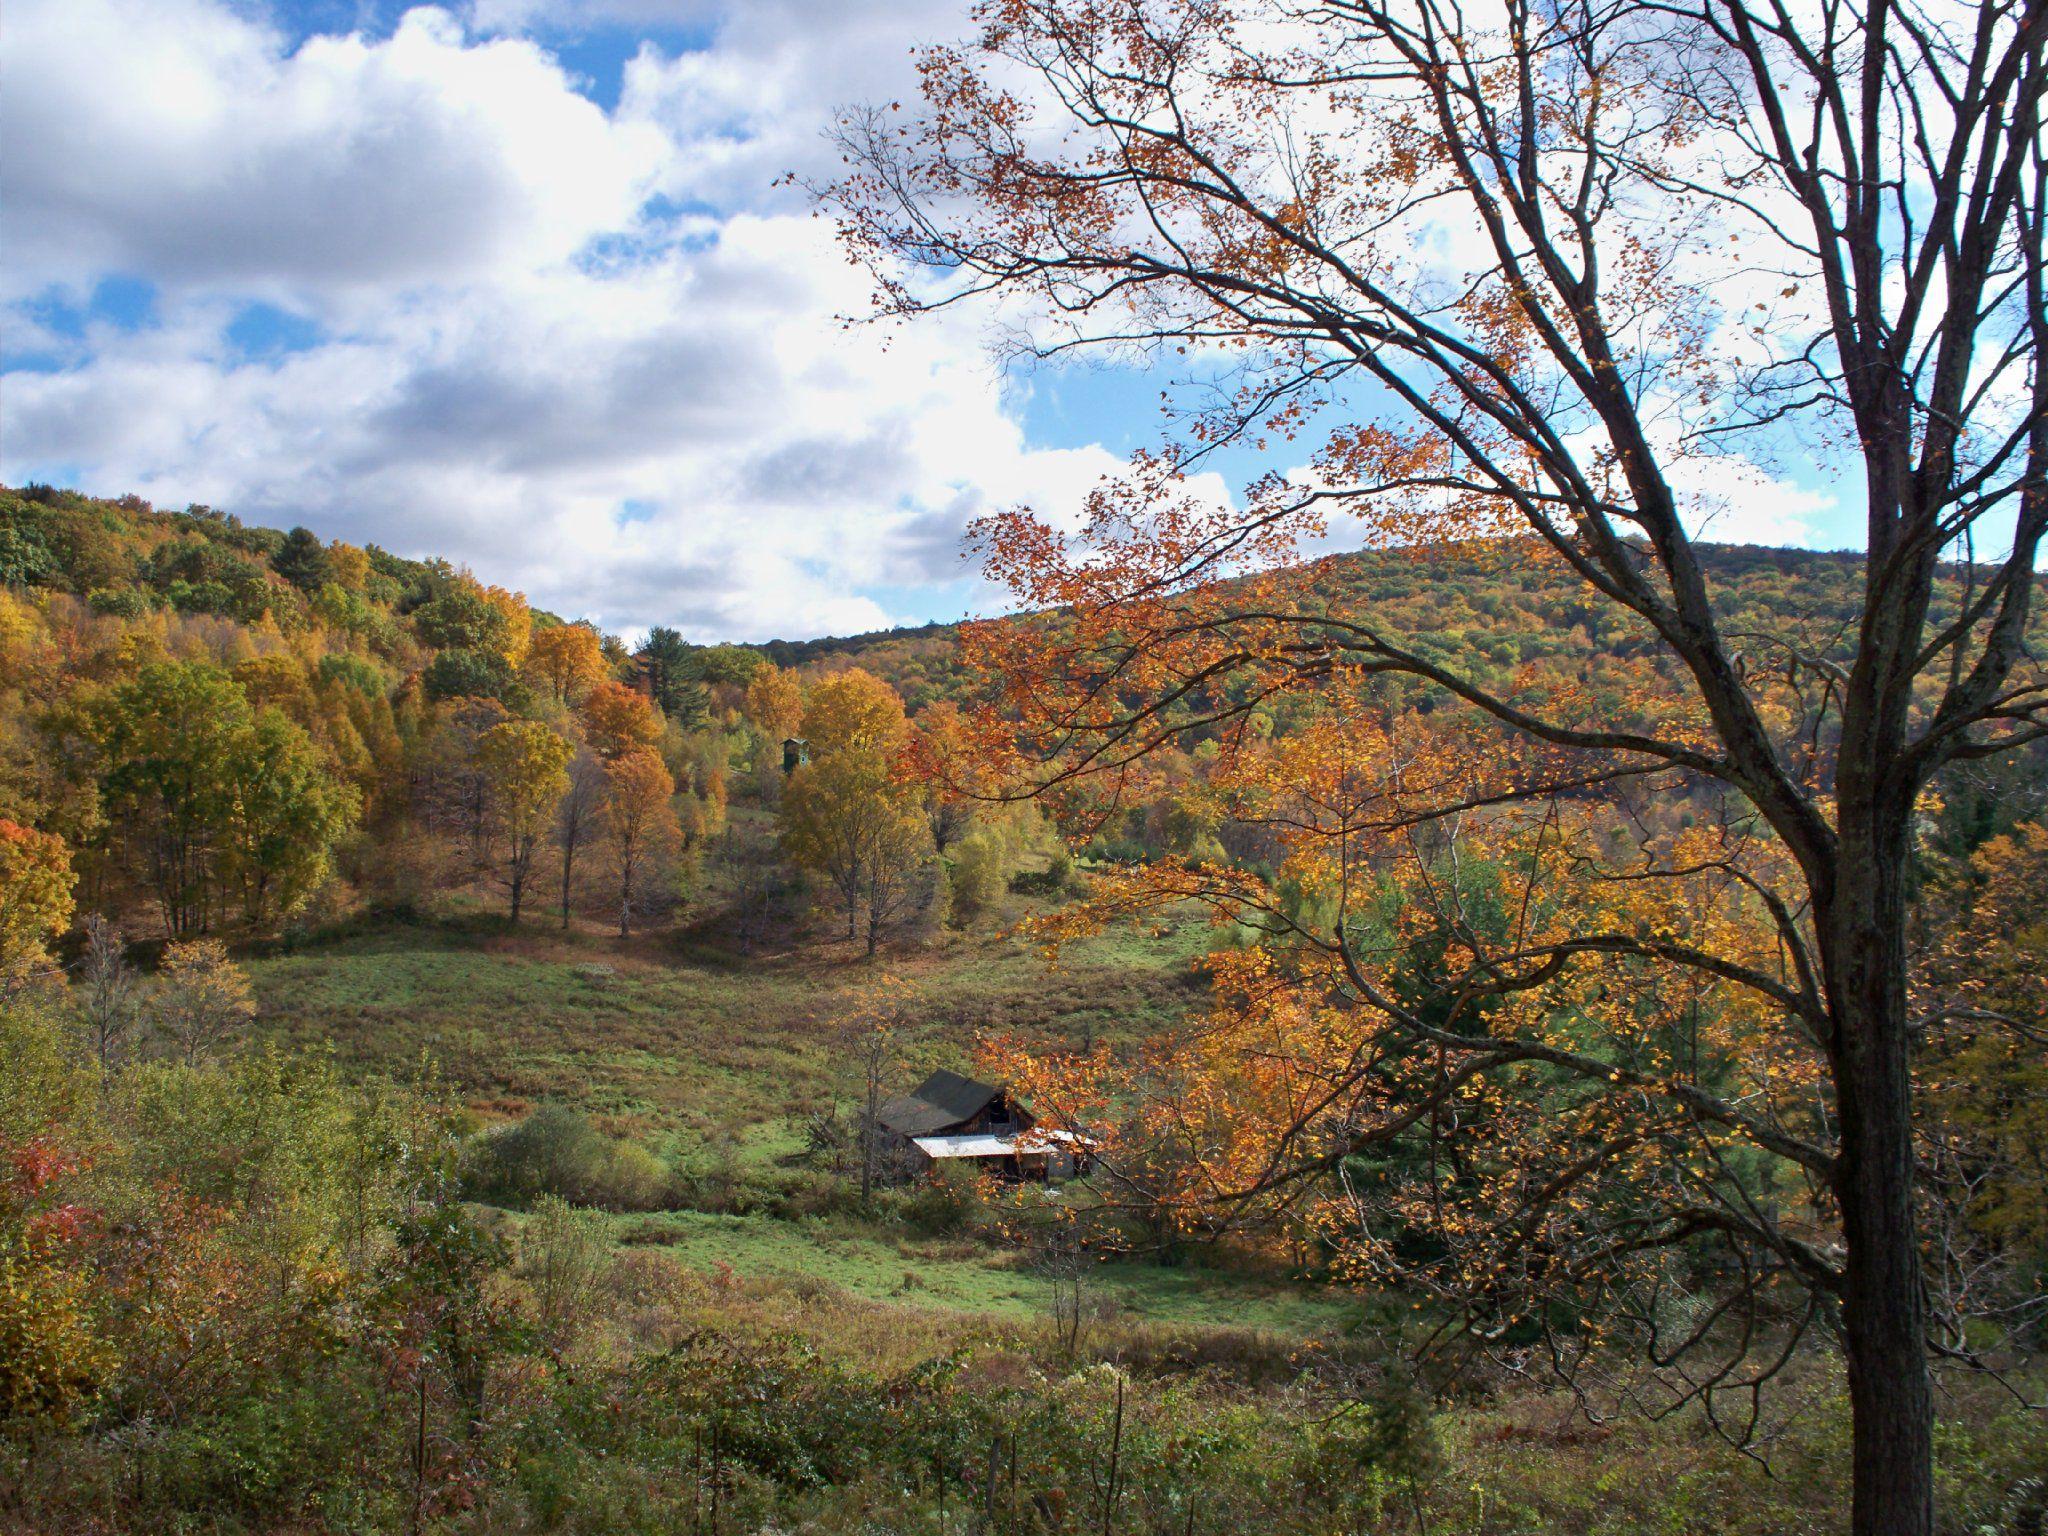 Hudson River: A Good Place for a Settlement